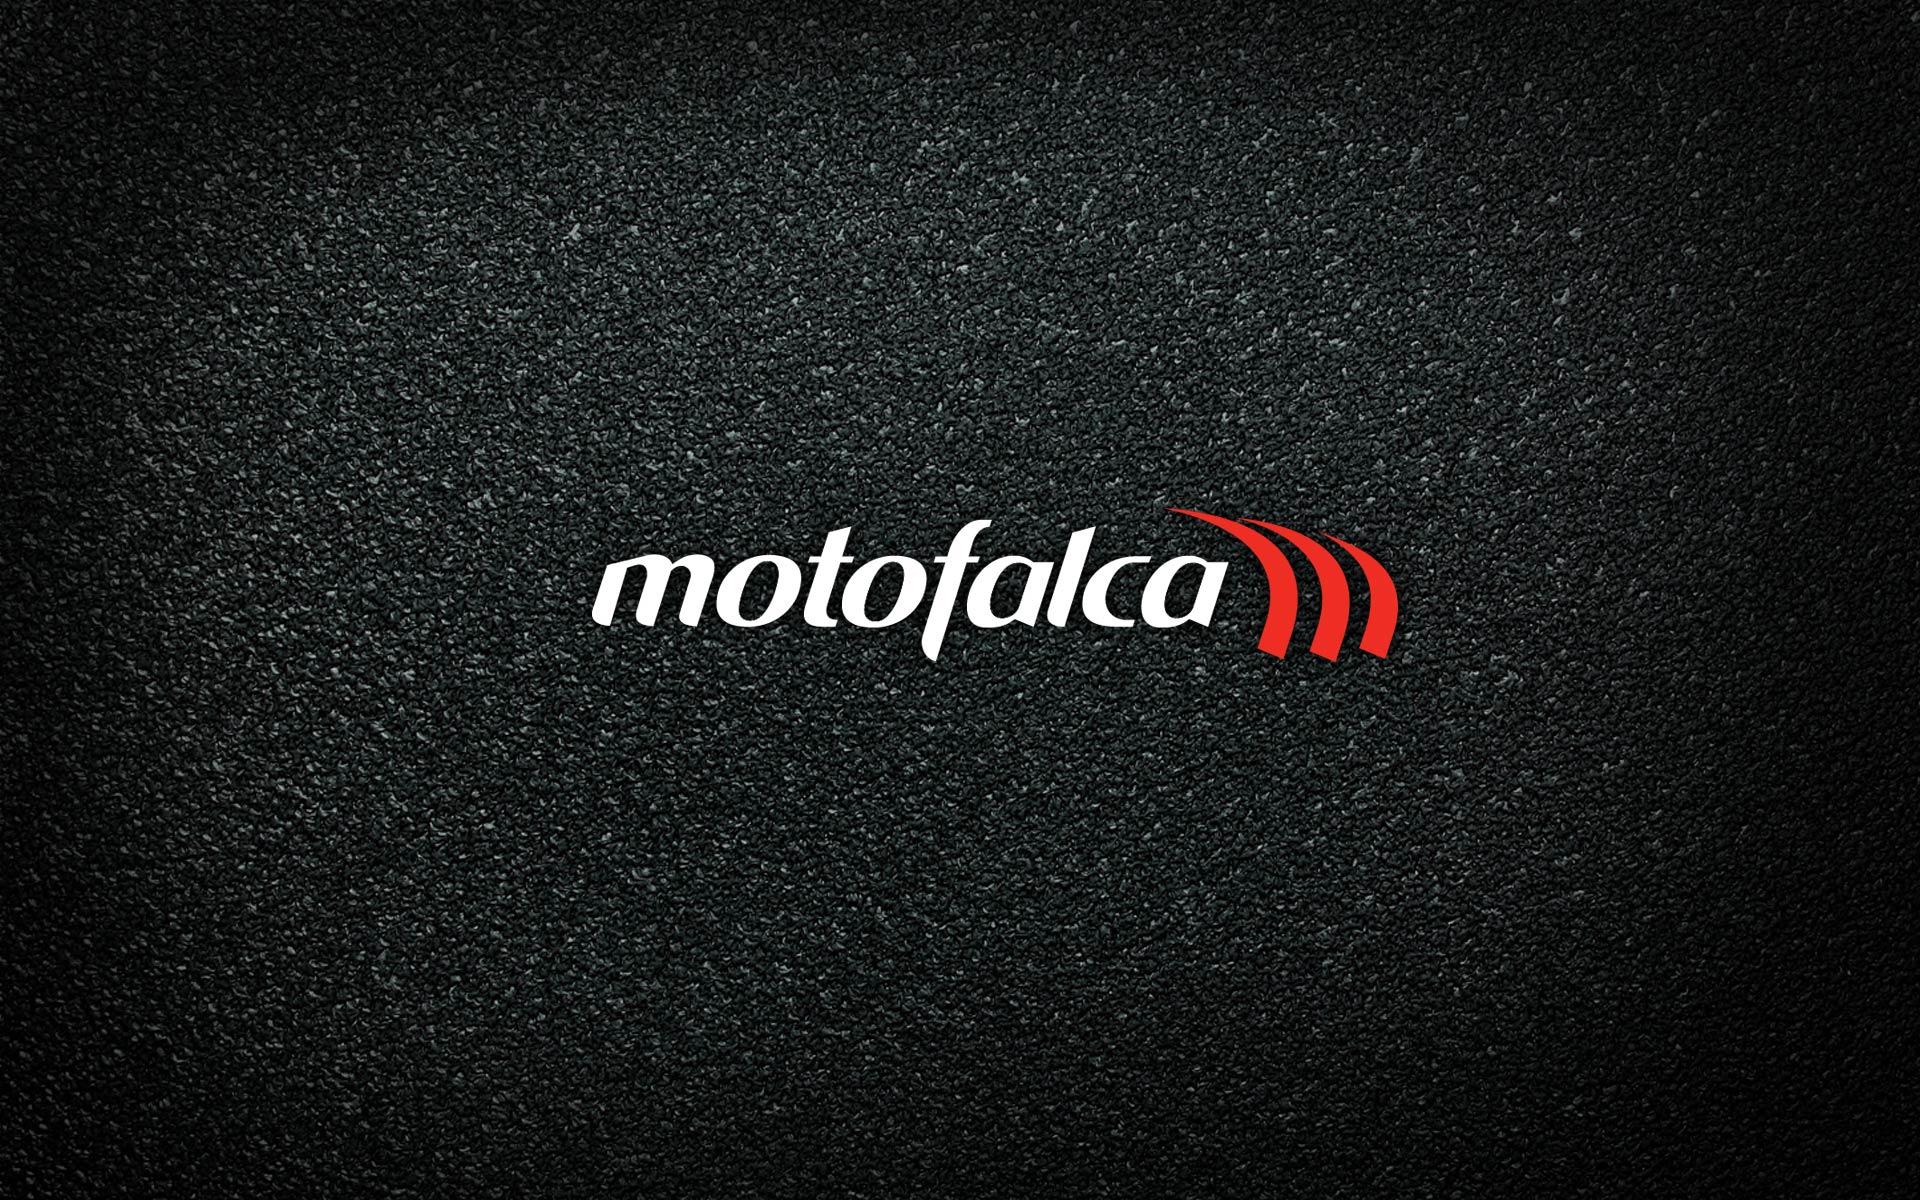 Motofalca